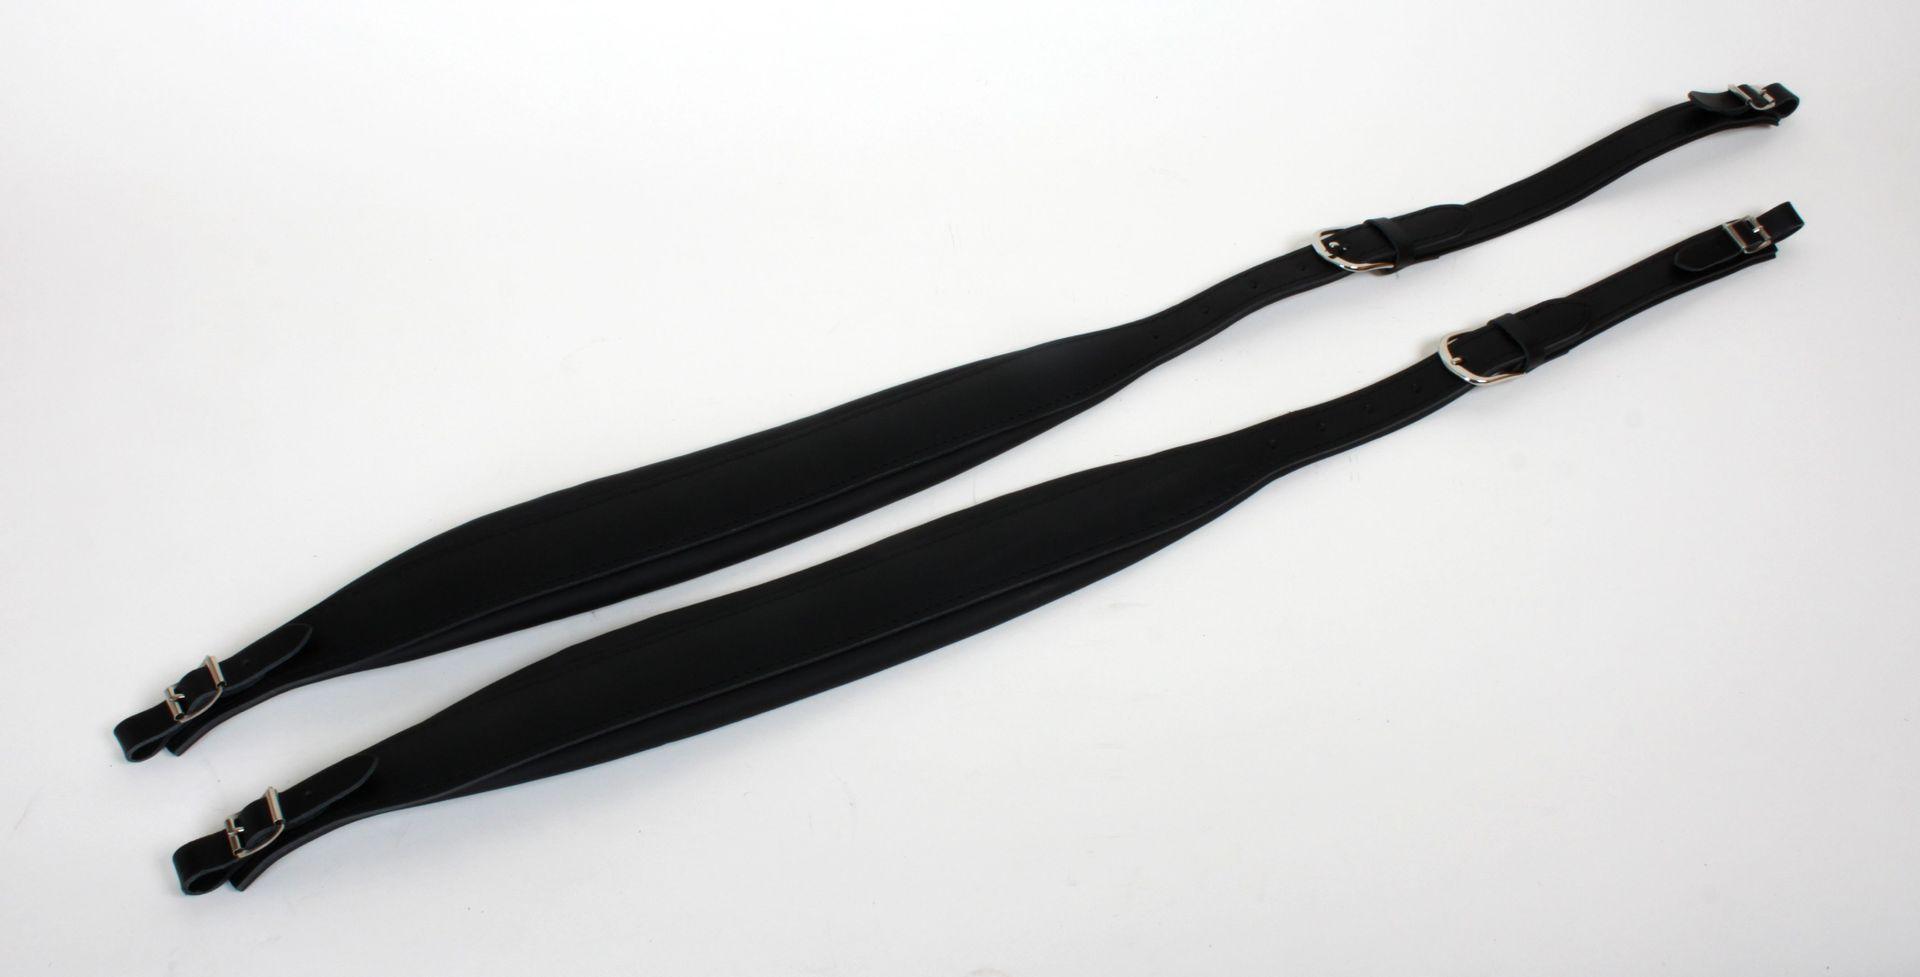 Weltmeister Trageriemen 37/41er Akkordeon 96/120 Bass, Leder schwarz, 61mm breit